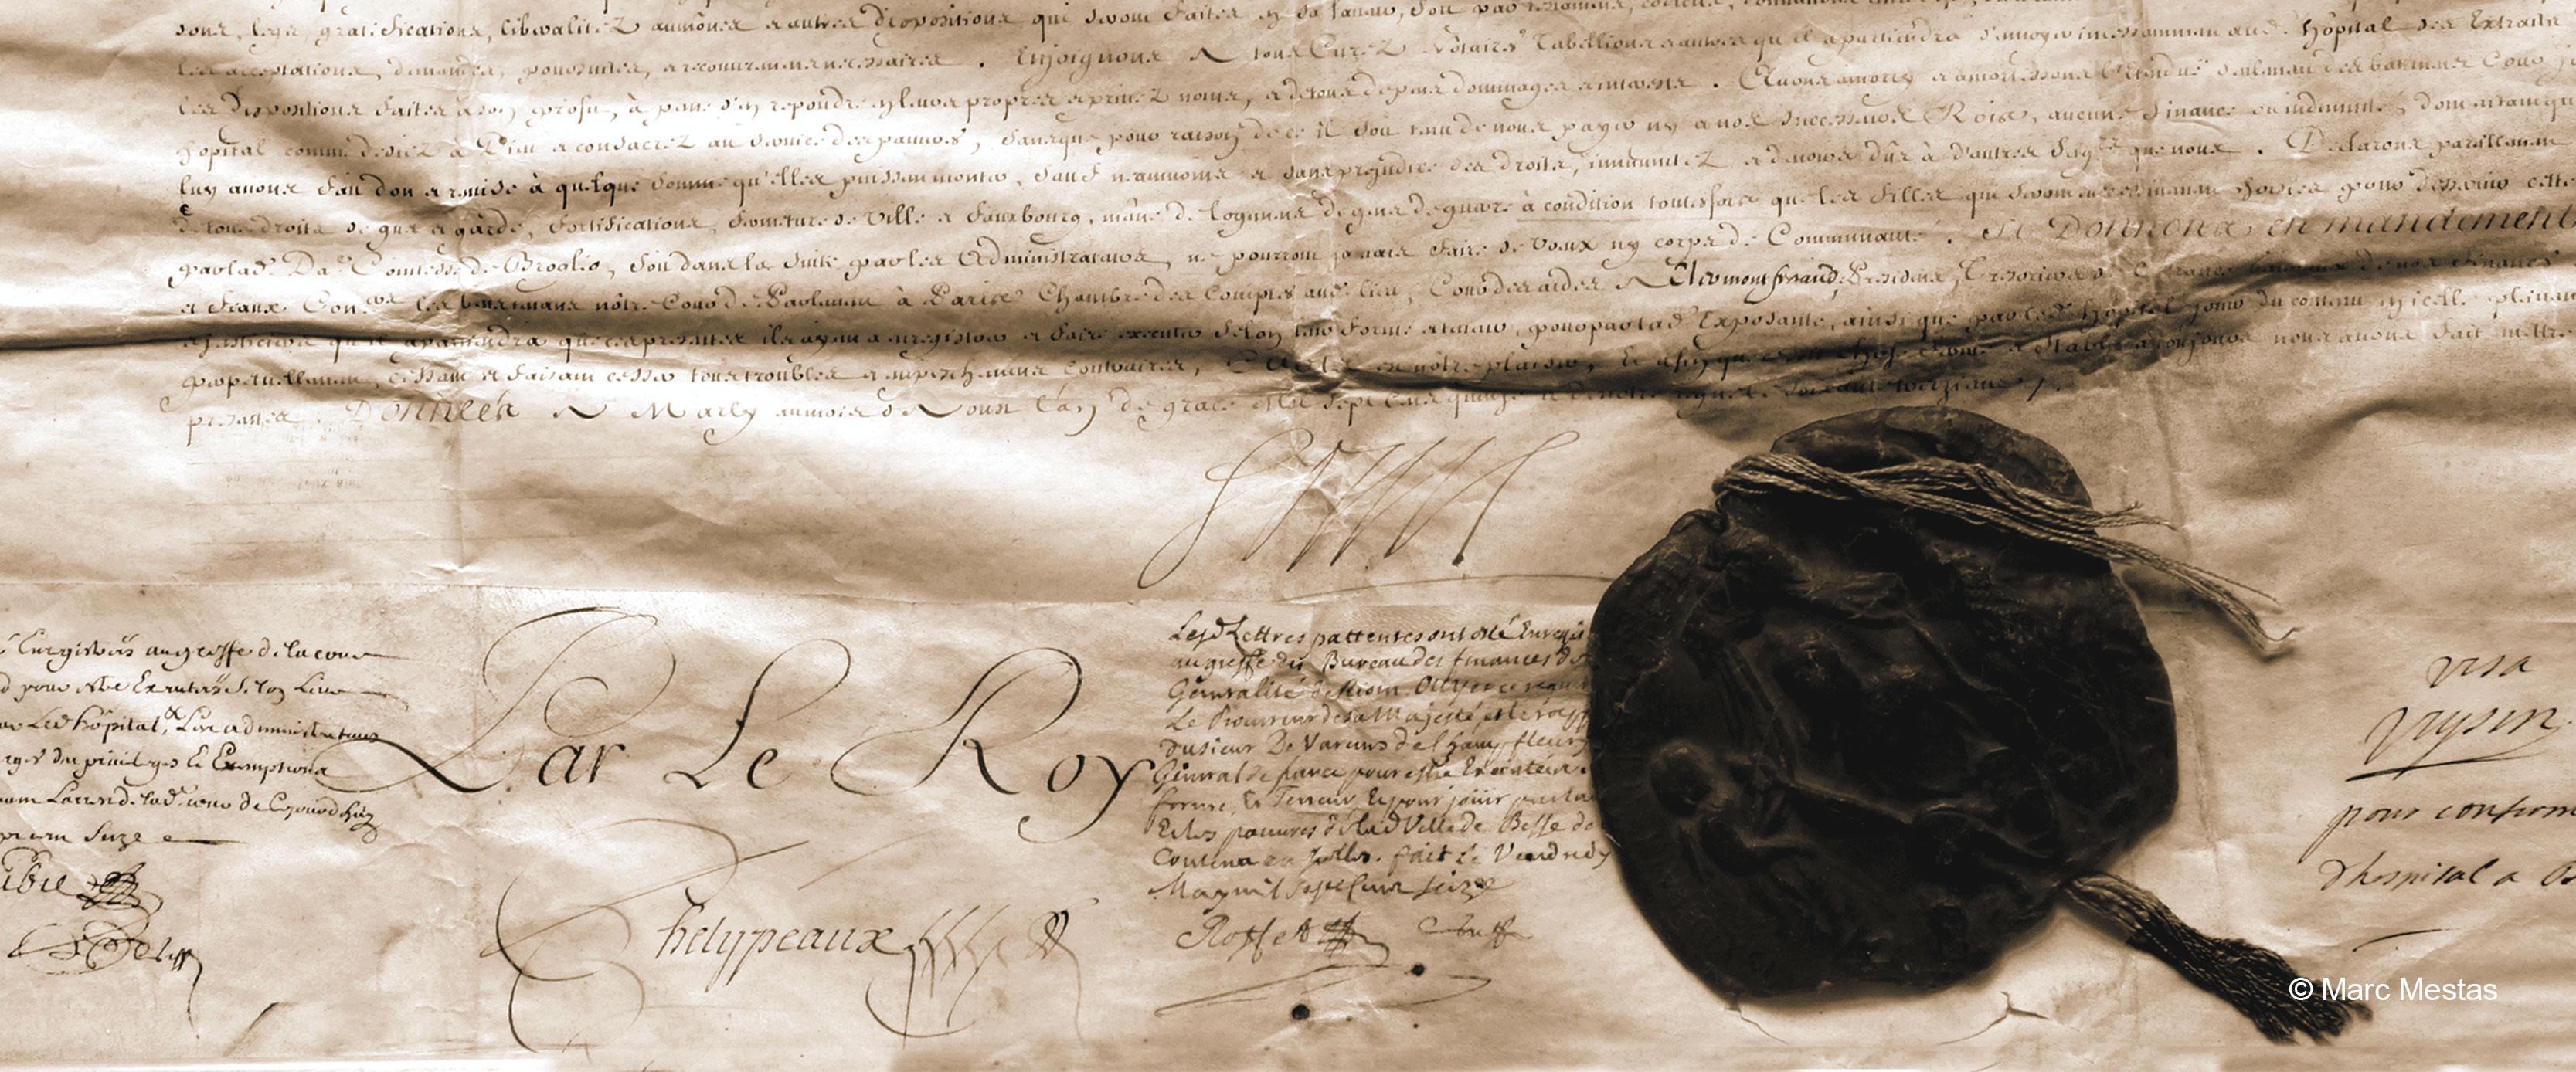 lettre-patente-toute-histoire.jpg